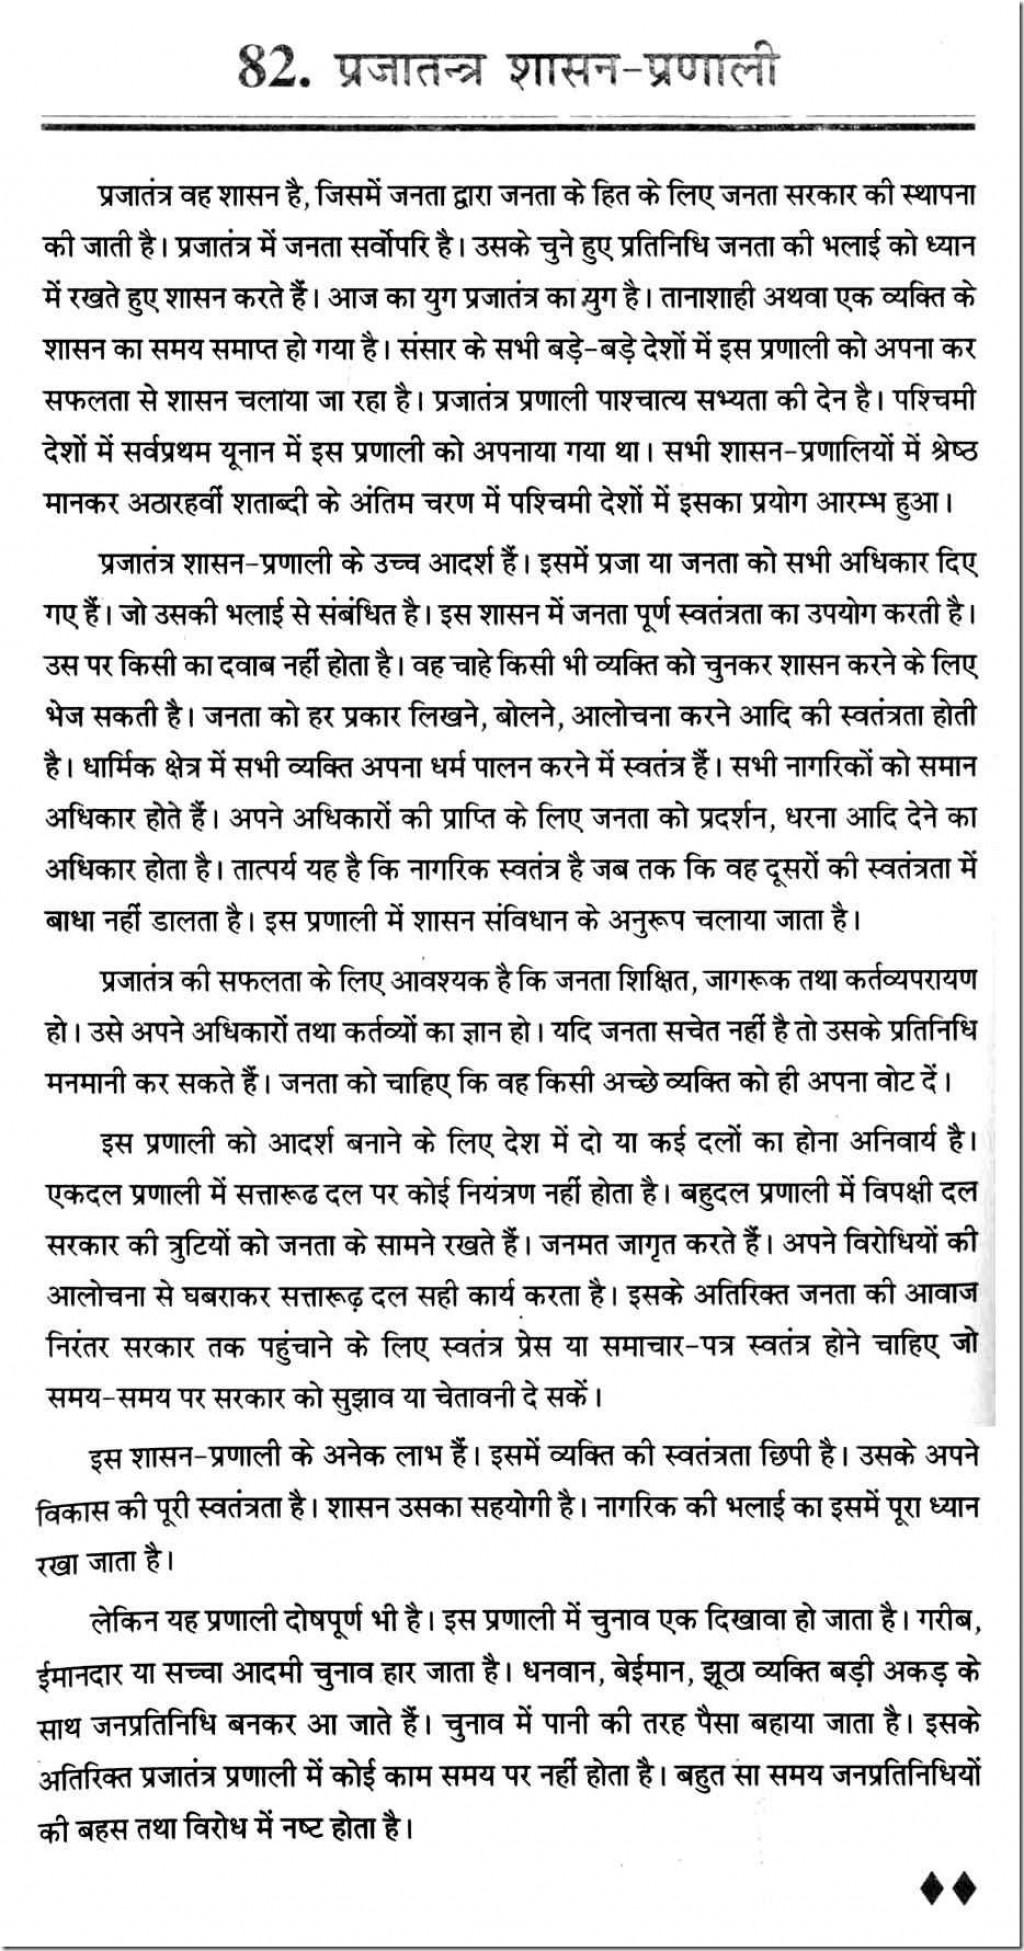 011 Essay Importance Democracy Thumb Of Voting Pdf In Kannada The Essays English Tamil Rights India Hindi On Punjabi Persuasive Unforgettable Marathi Large